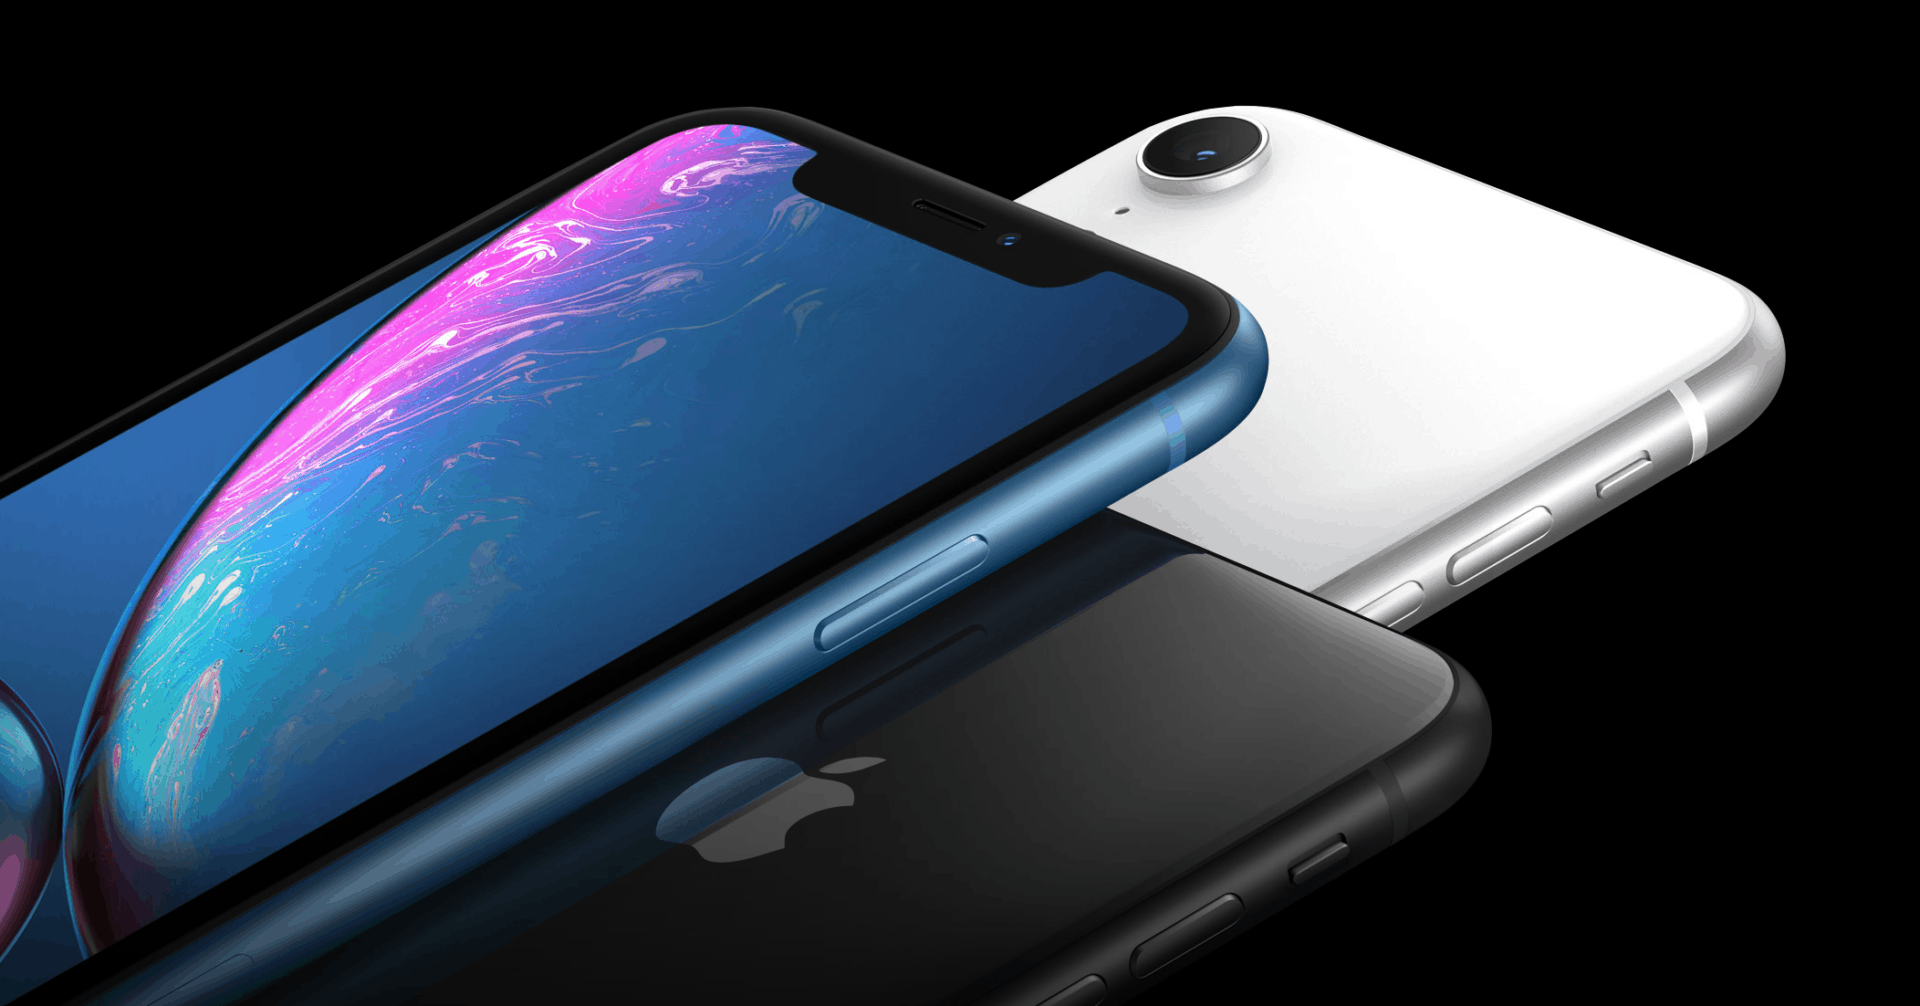 iPhone Xr bude dostupný ve velikostech 64GB, 128 a 256GB